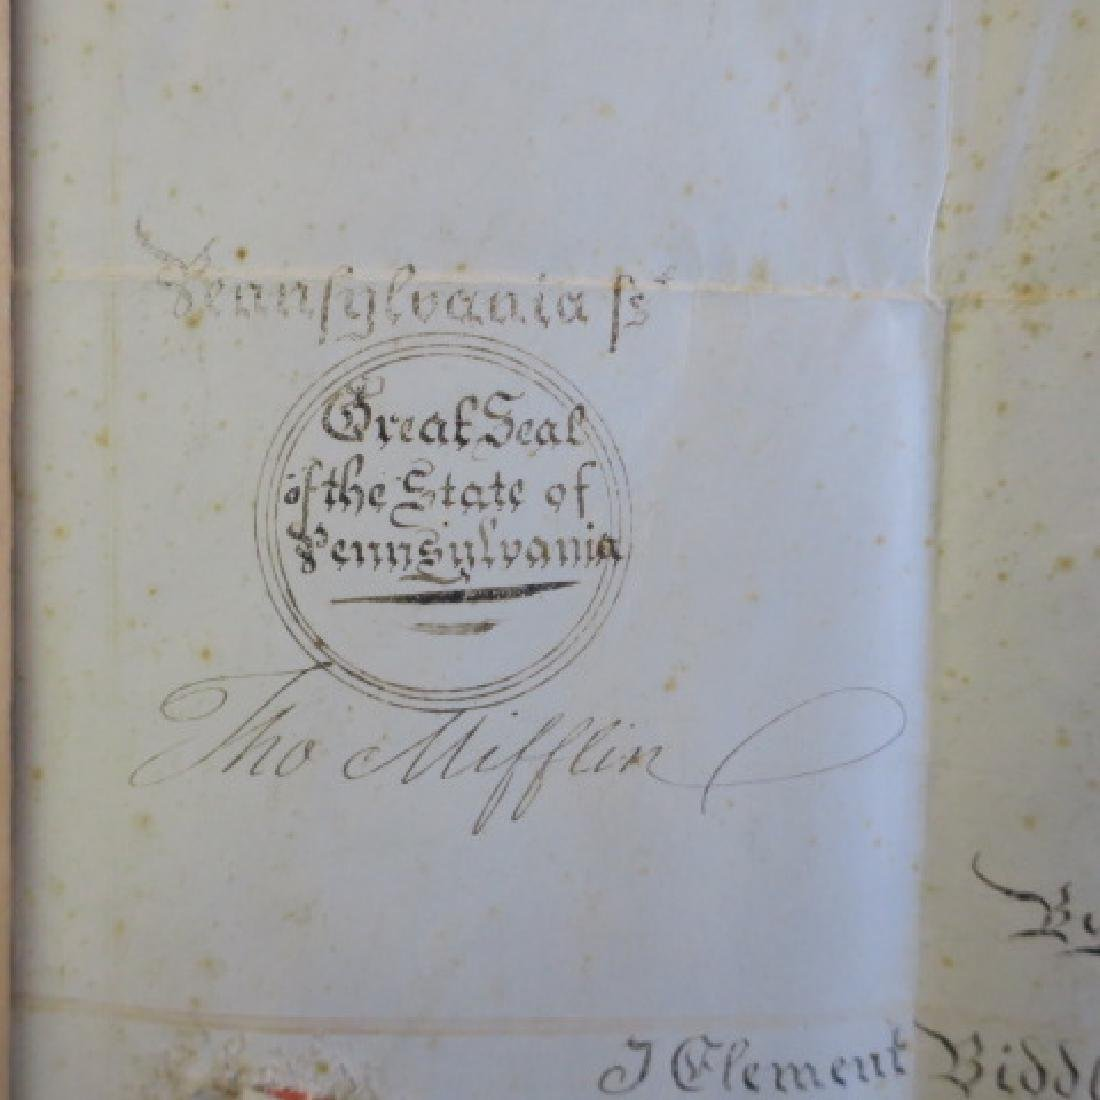 PENNSYLVANIA LAND GRANT, JOHN NICHOLSON, 1795: - 2